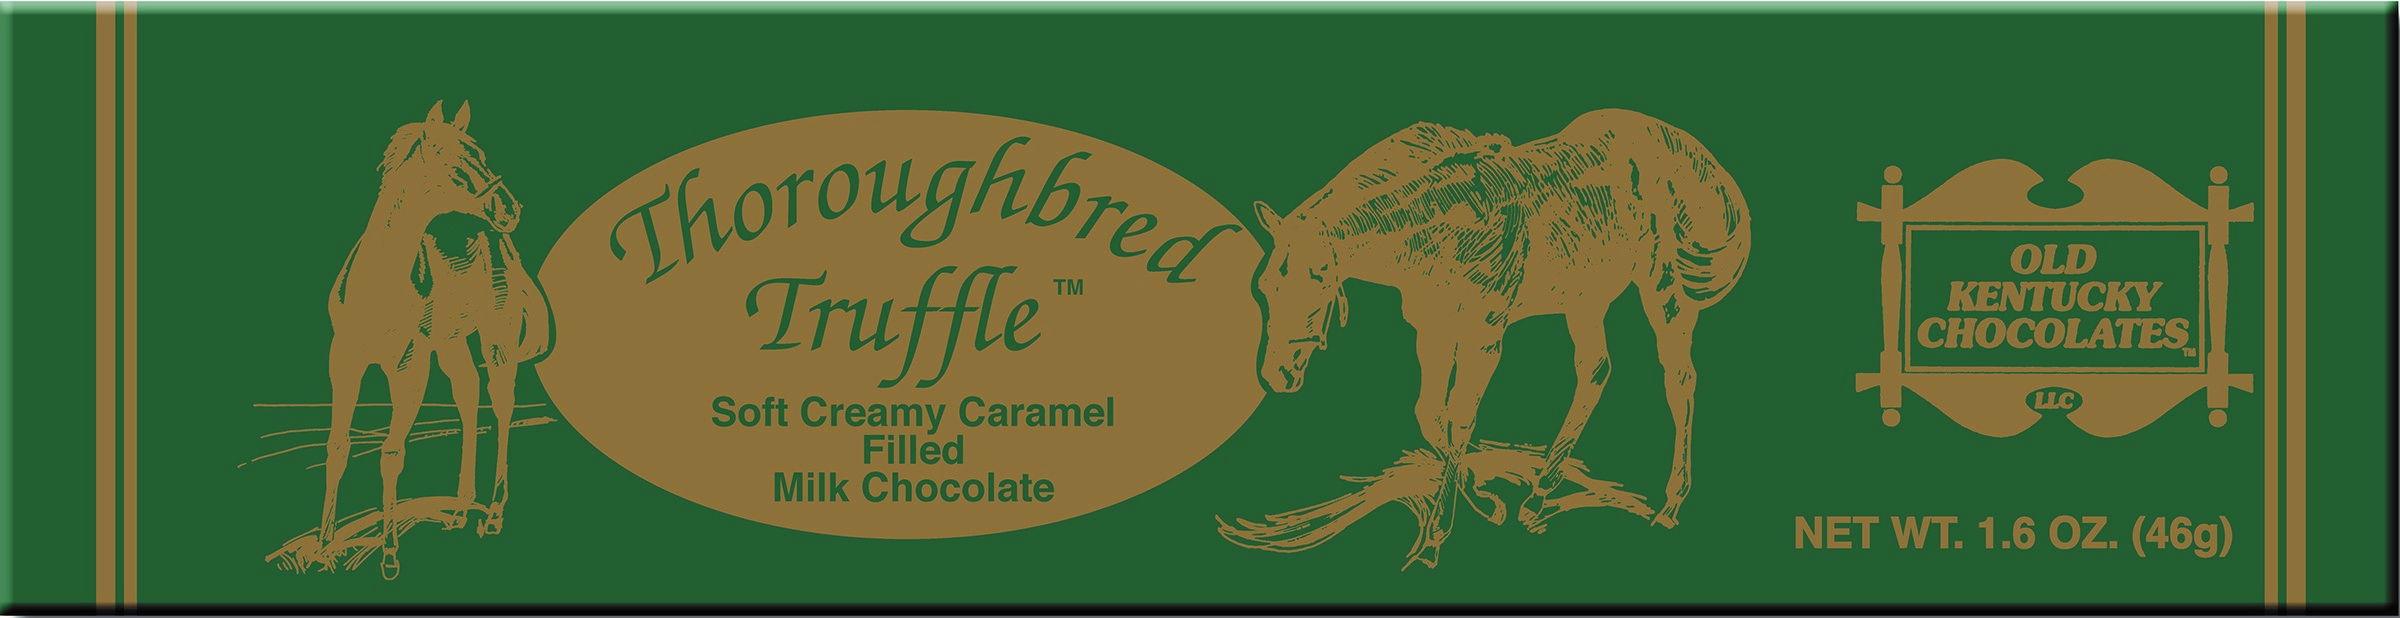 Old Kentucky Chocolates Thoroughbred Truffle Caramel Fundraising